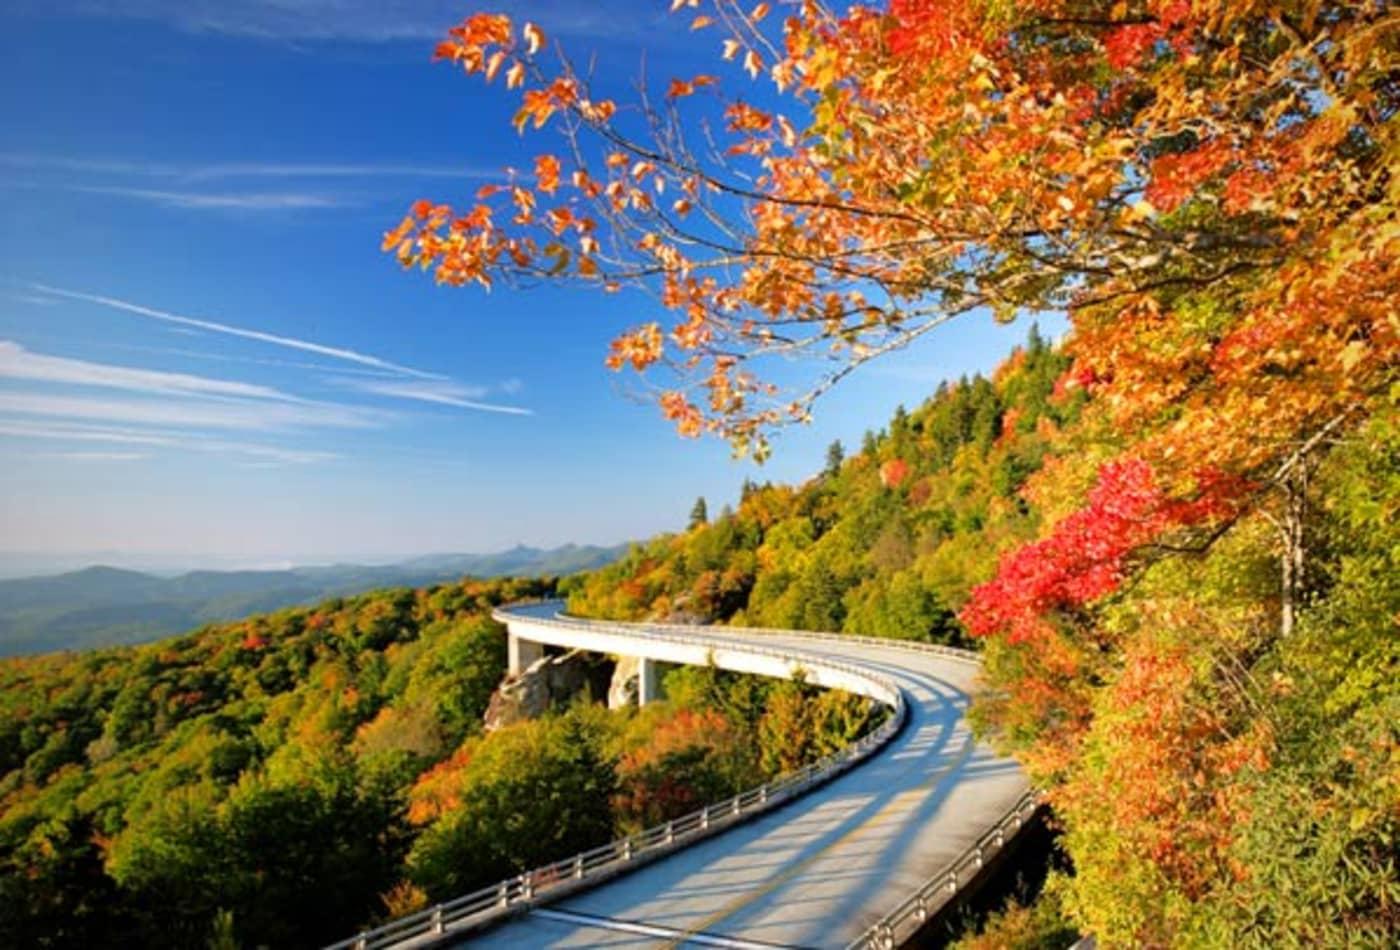 SS_Best_Fall_Drives_North_Carolina.jpg